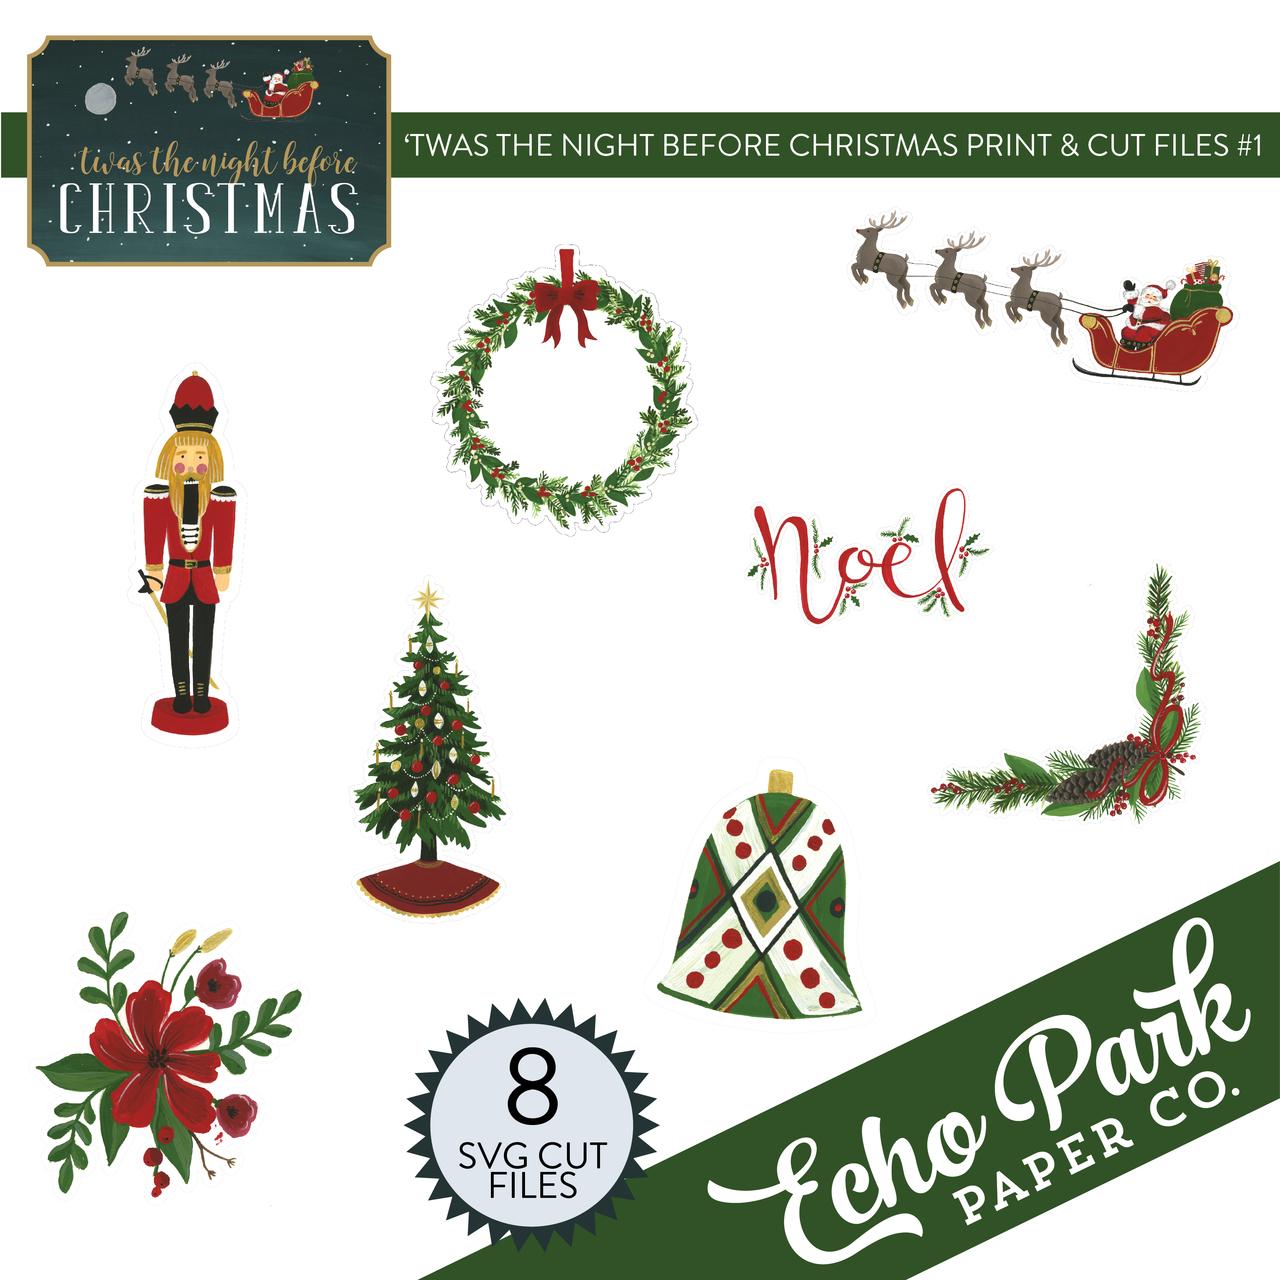 'Twas The Night Before Christmas Print & Cut Files #1